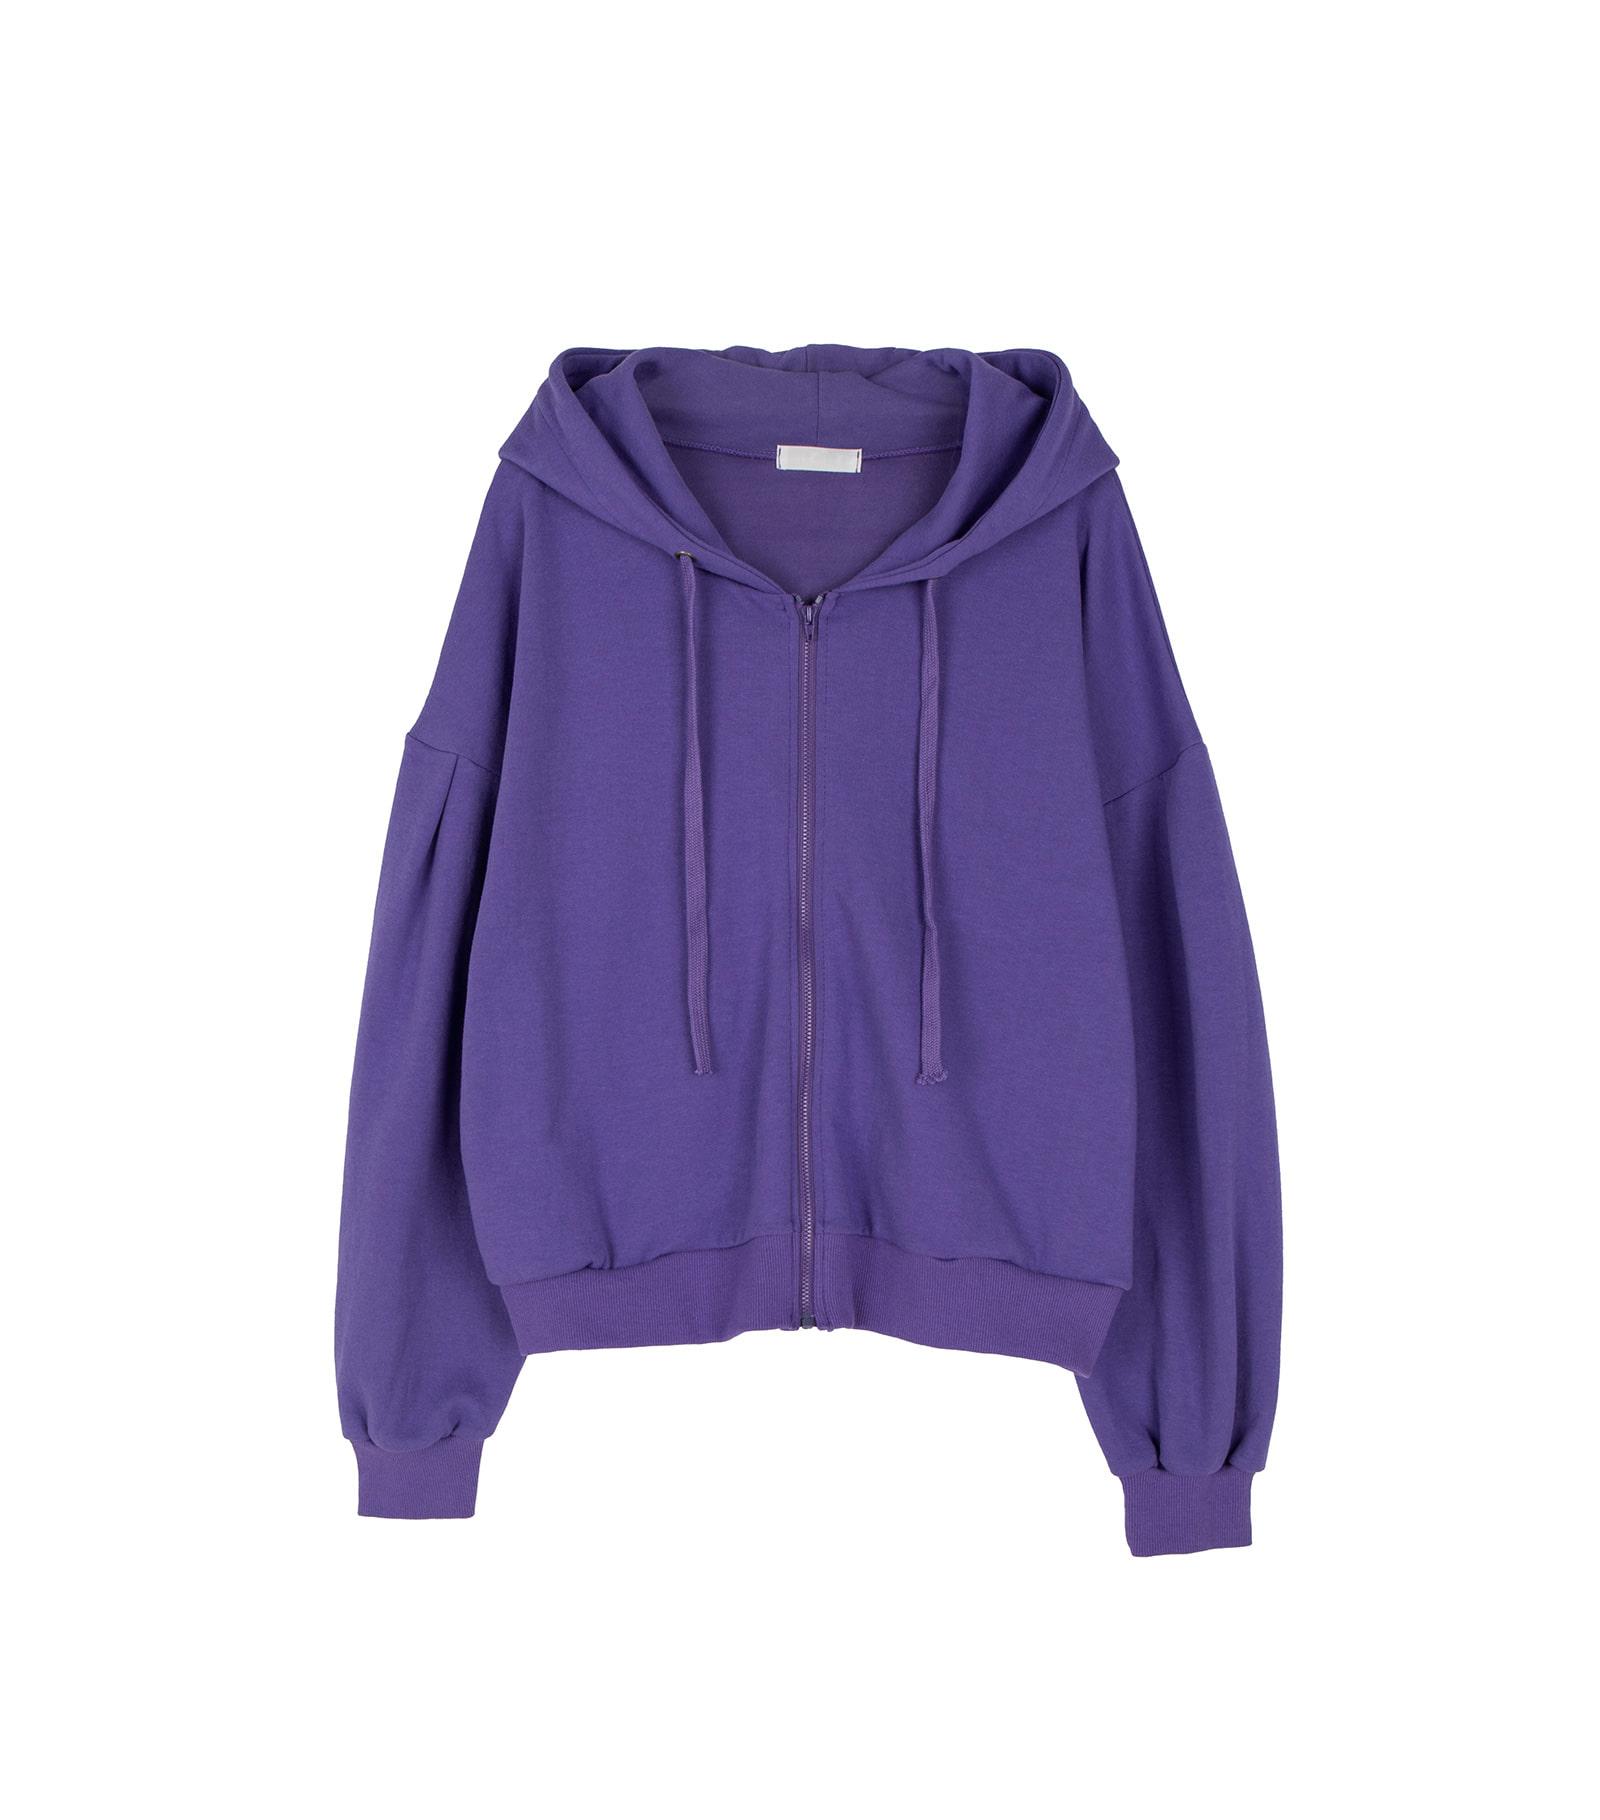 Hershey puff zip-up sweatshirt